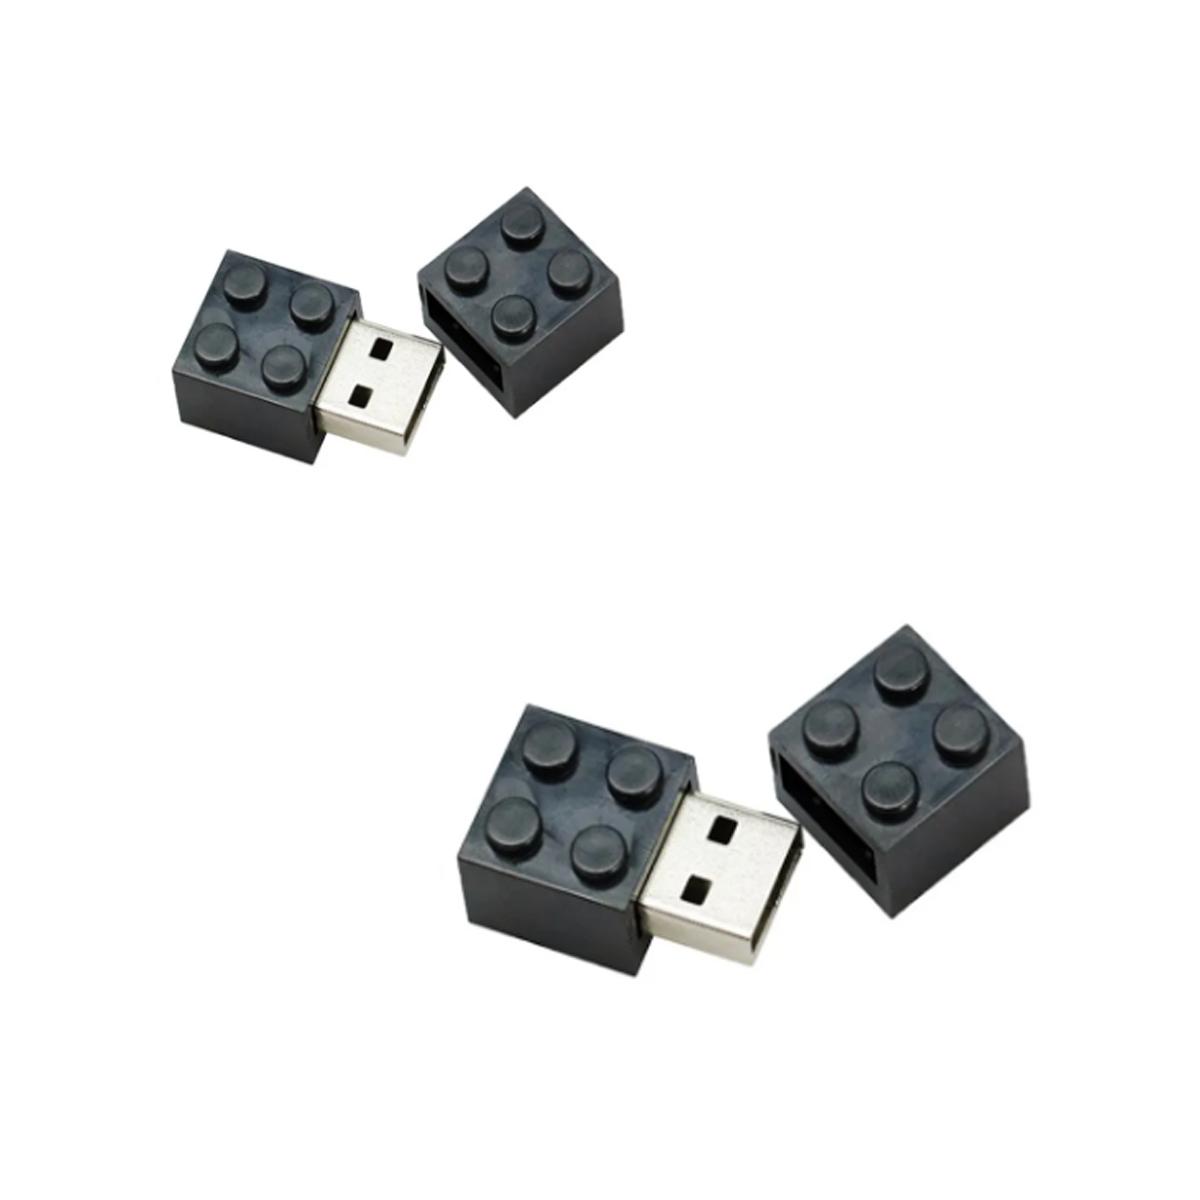 Pendrive Lego Preto de 64 GB USB 2.0